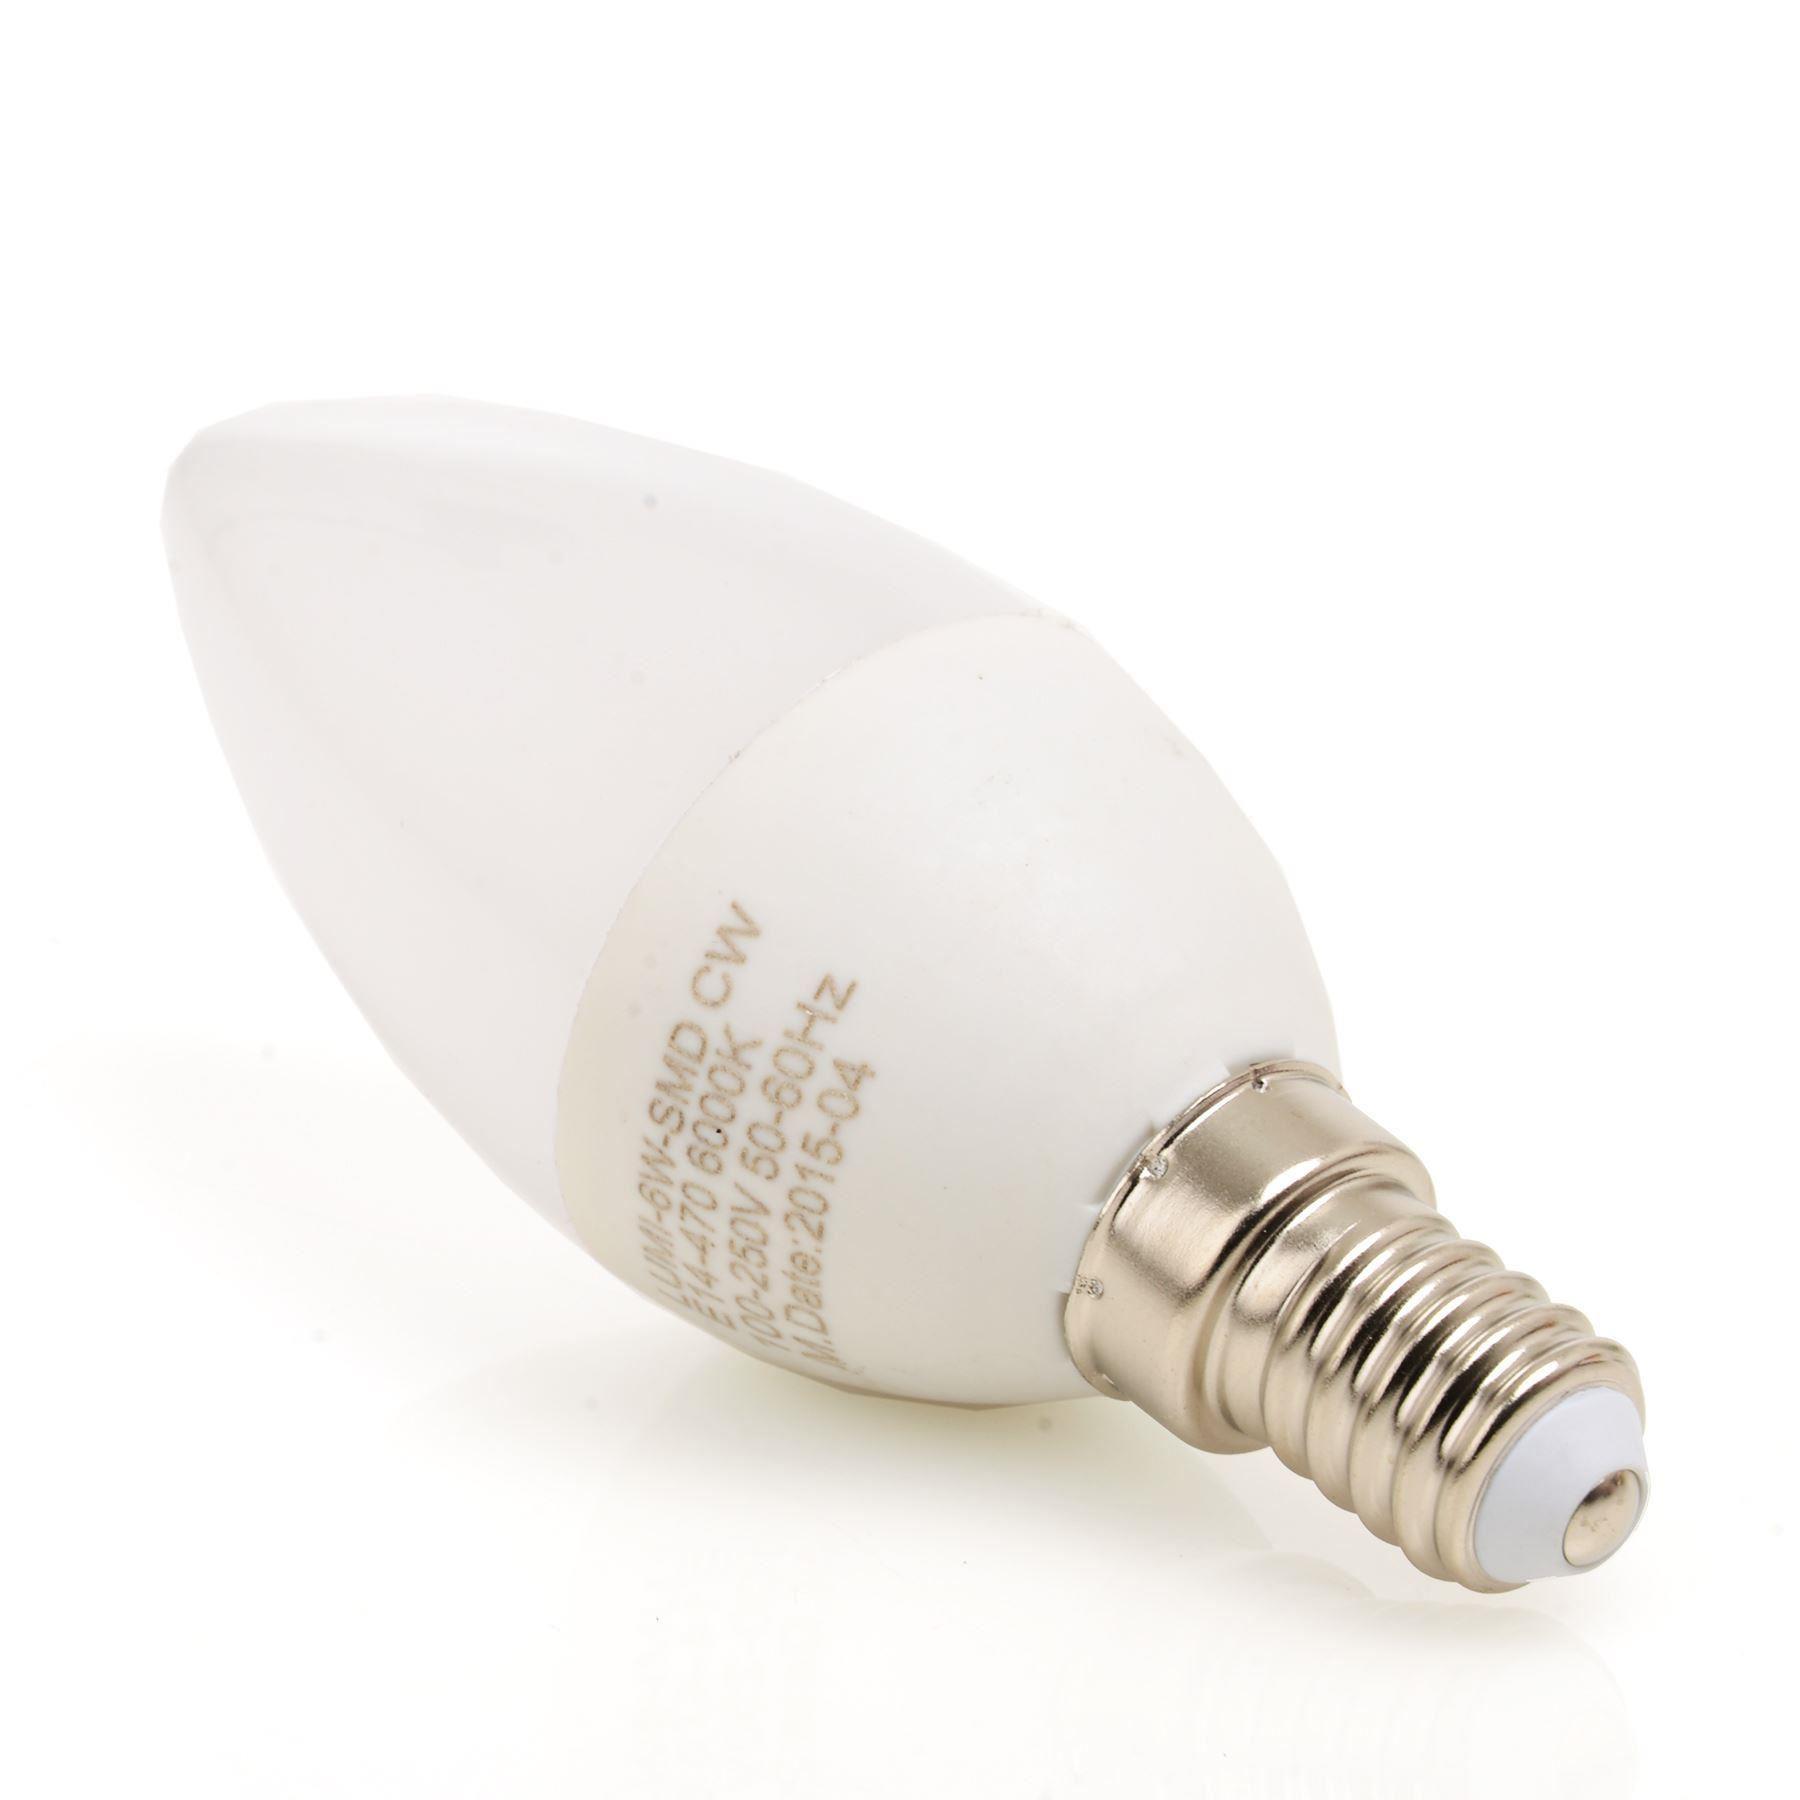 6w led e14 ses c37 candle light bulbs energy saving. Black Bedroom Furniture Sets. Home Design Ideas